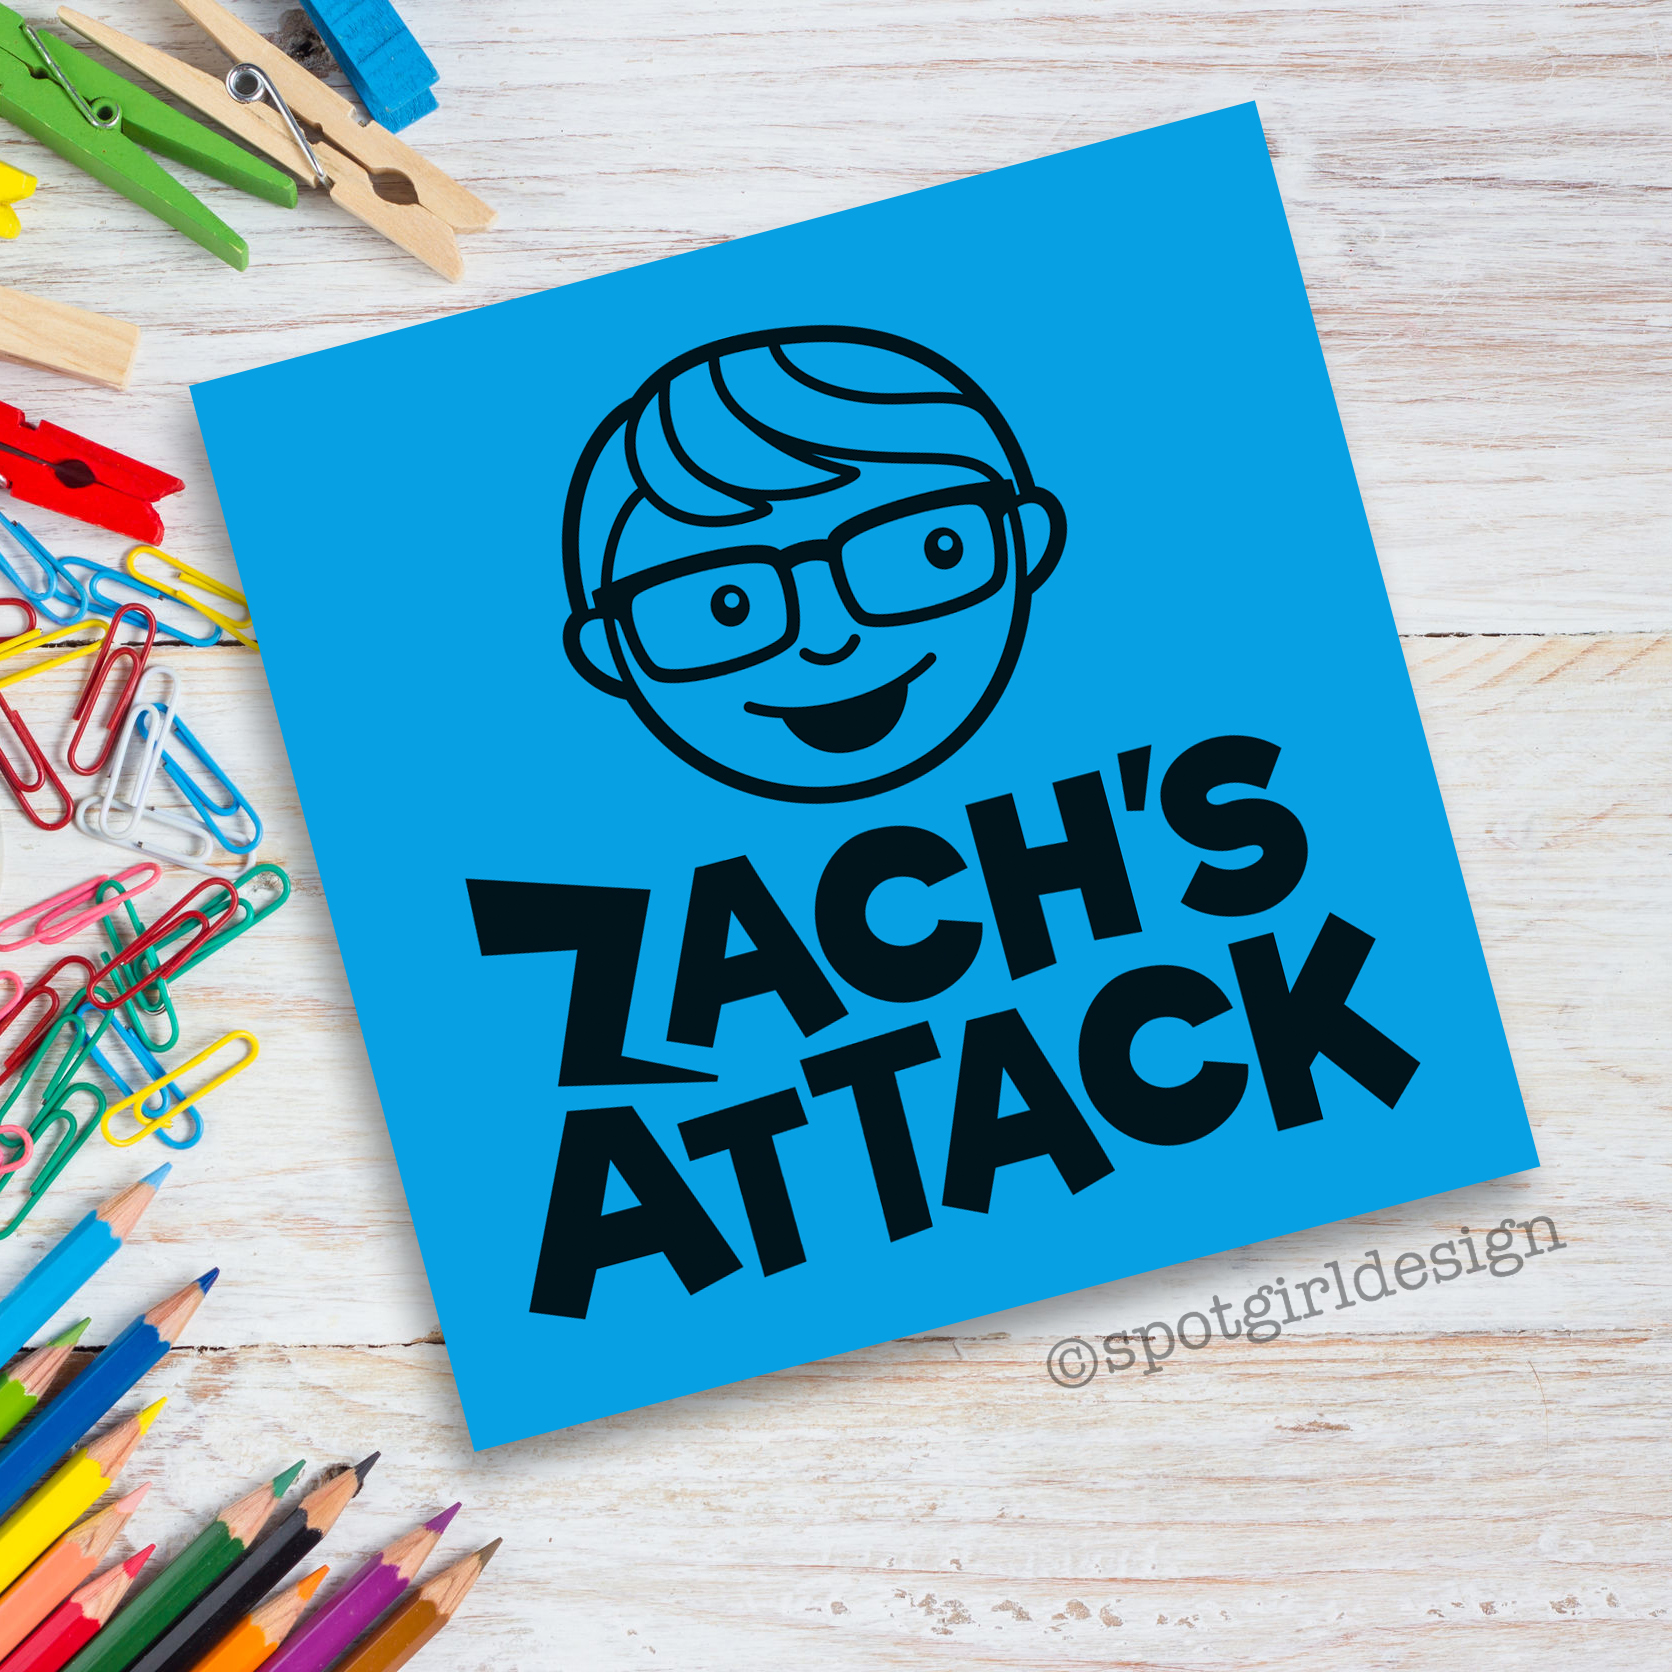 Zach's Attack Logo